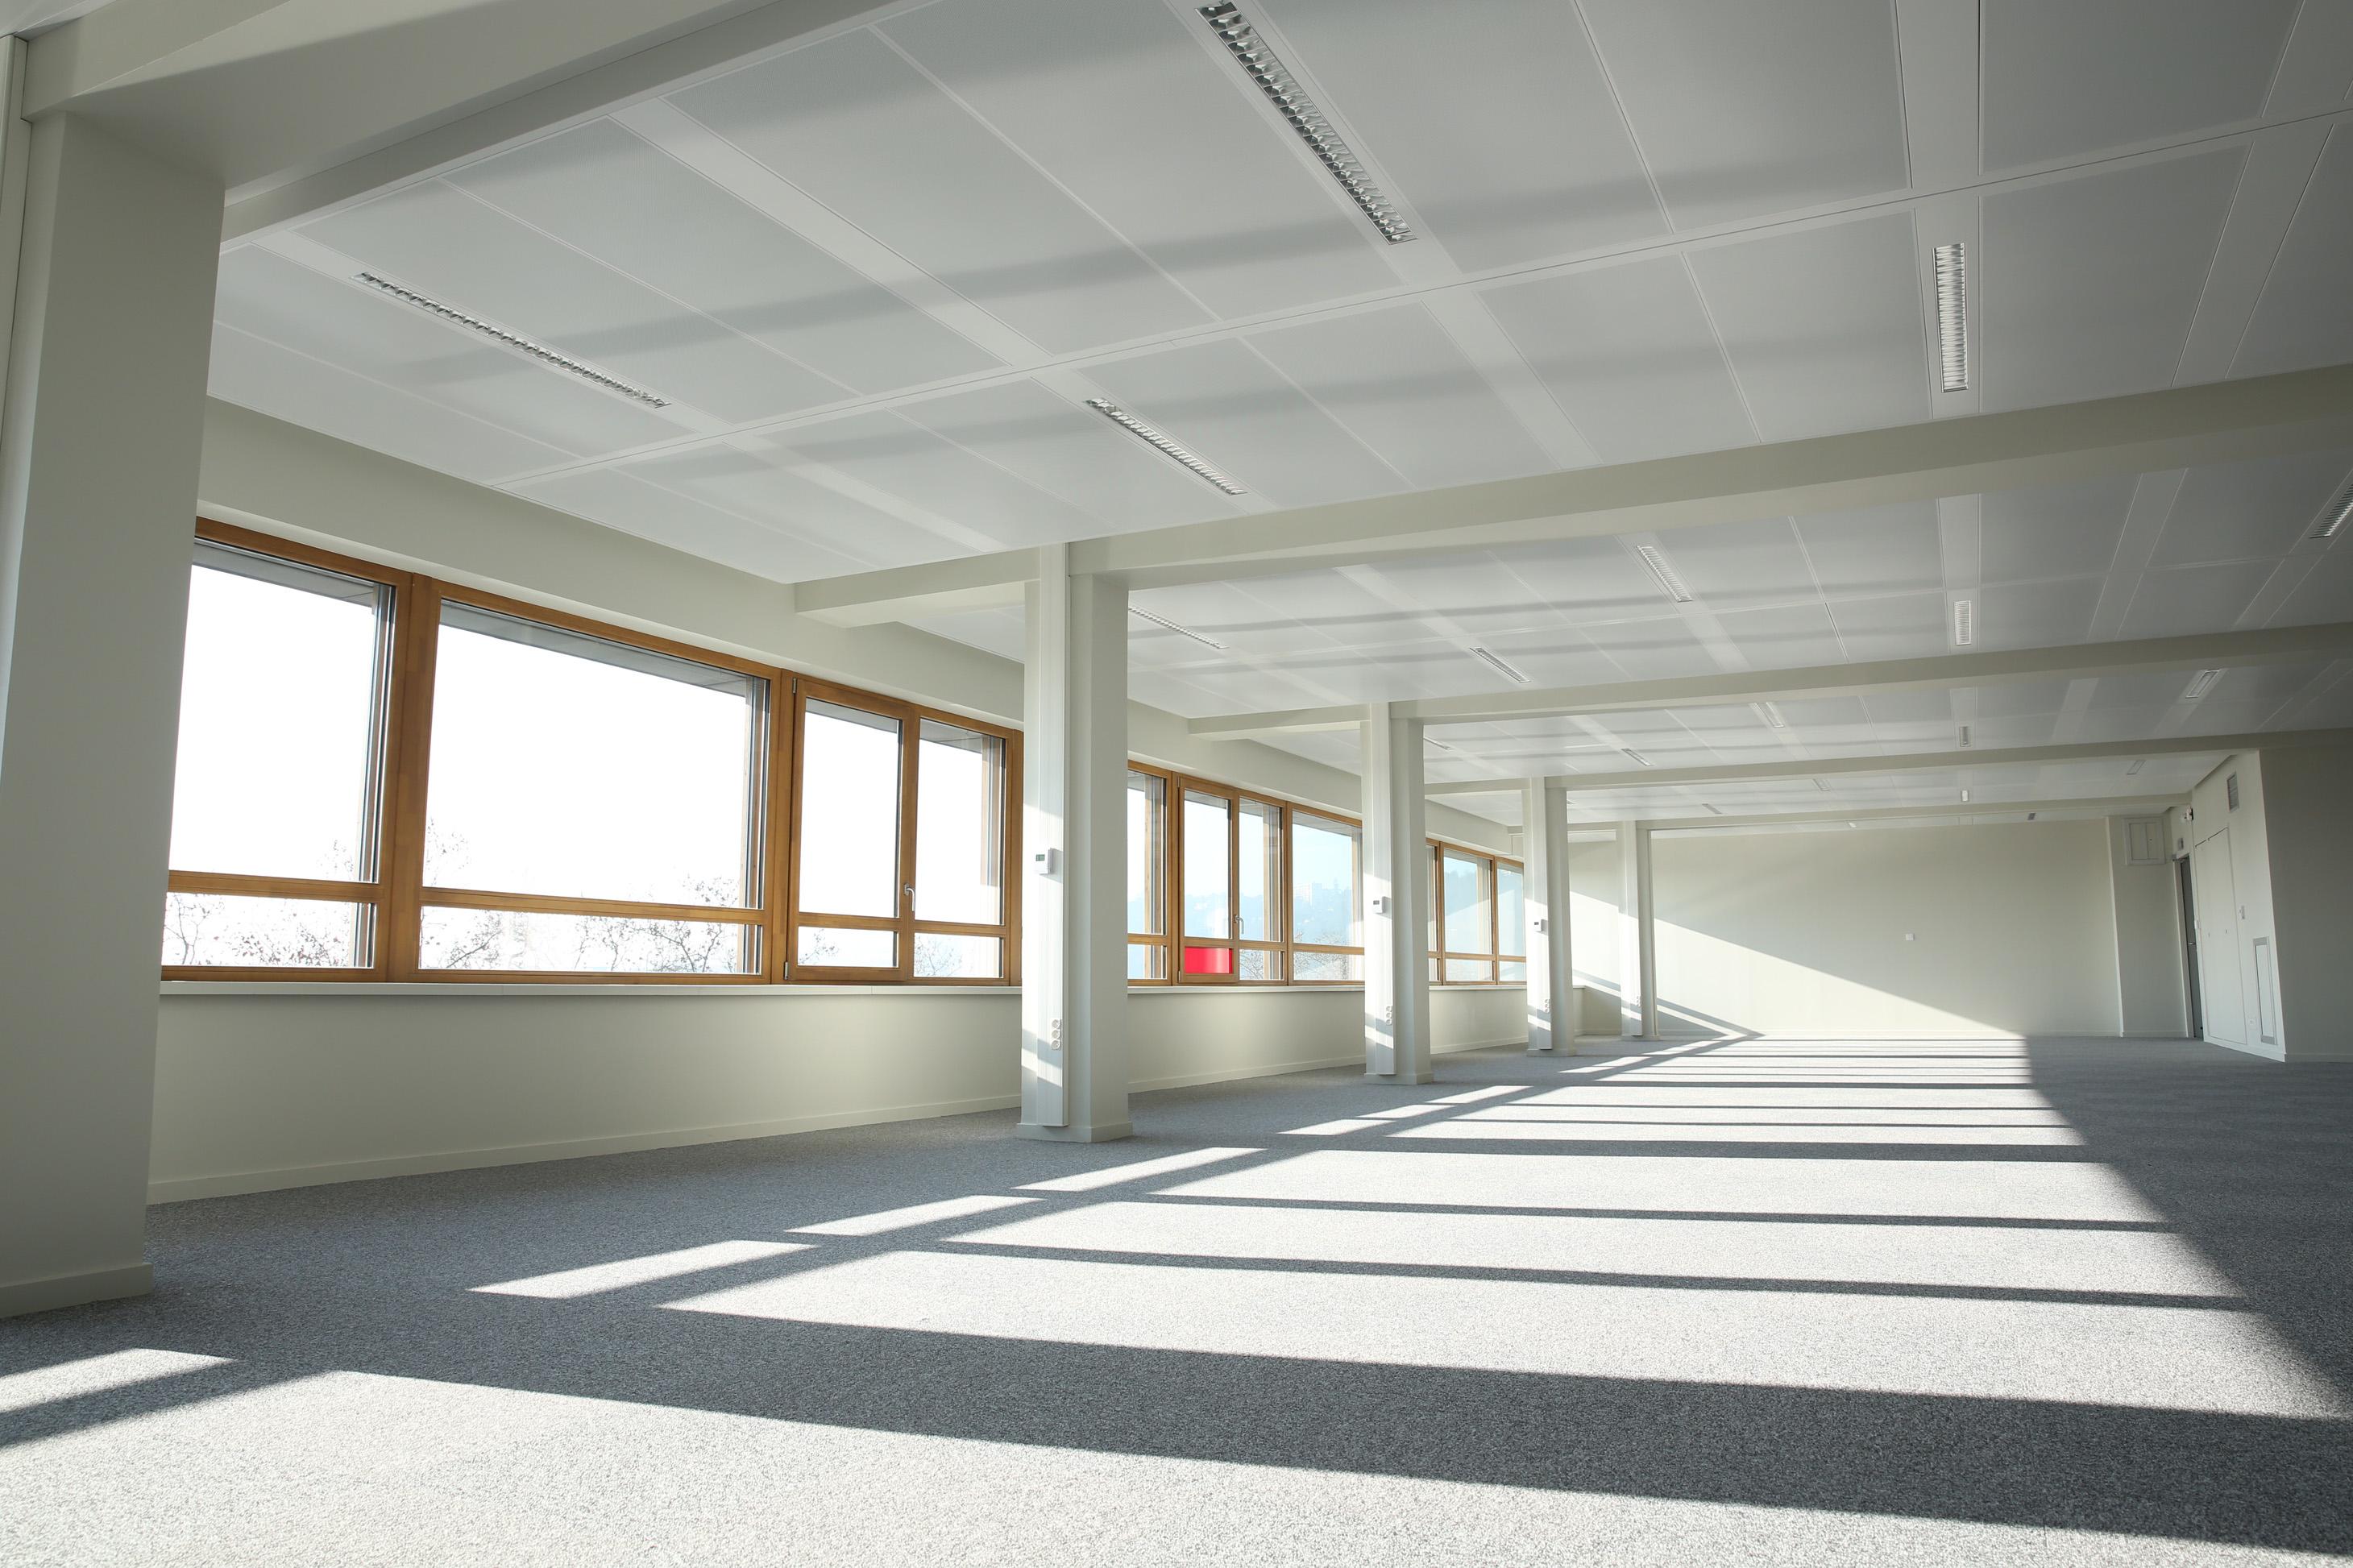 5 000 m2 de plafonds chauffants rafra chissants zehnder for Faux plafond chauffant